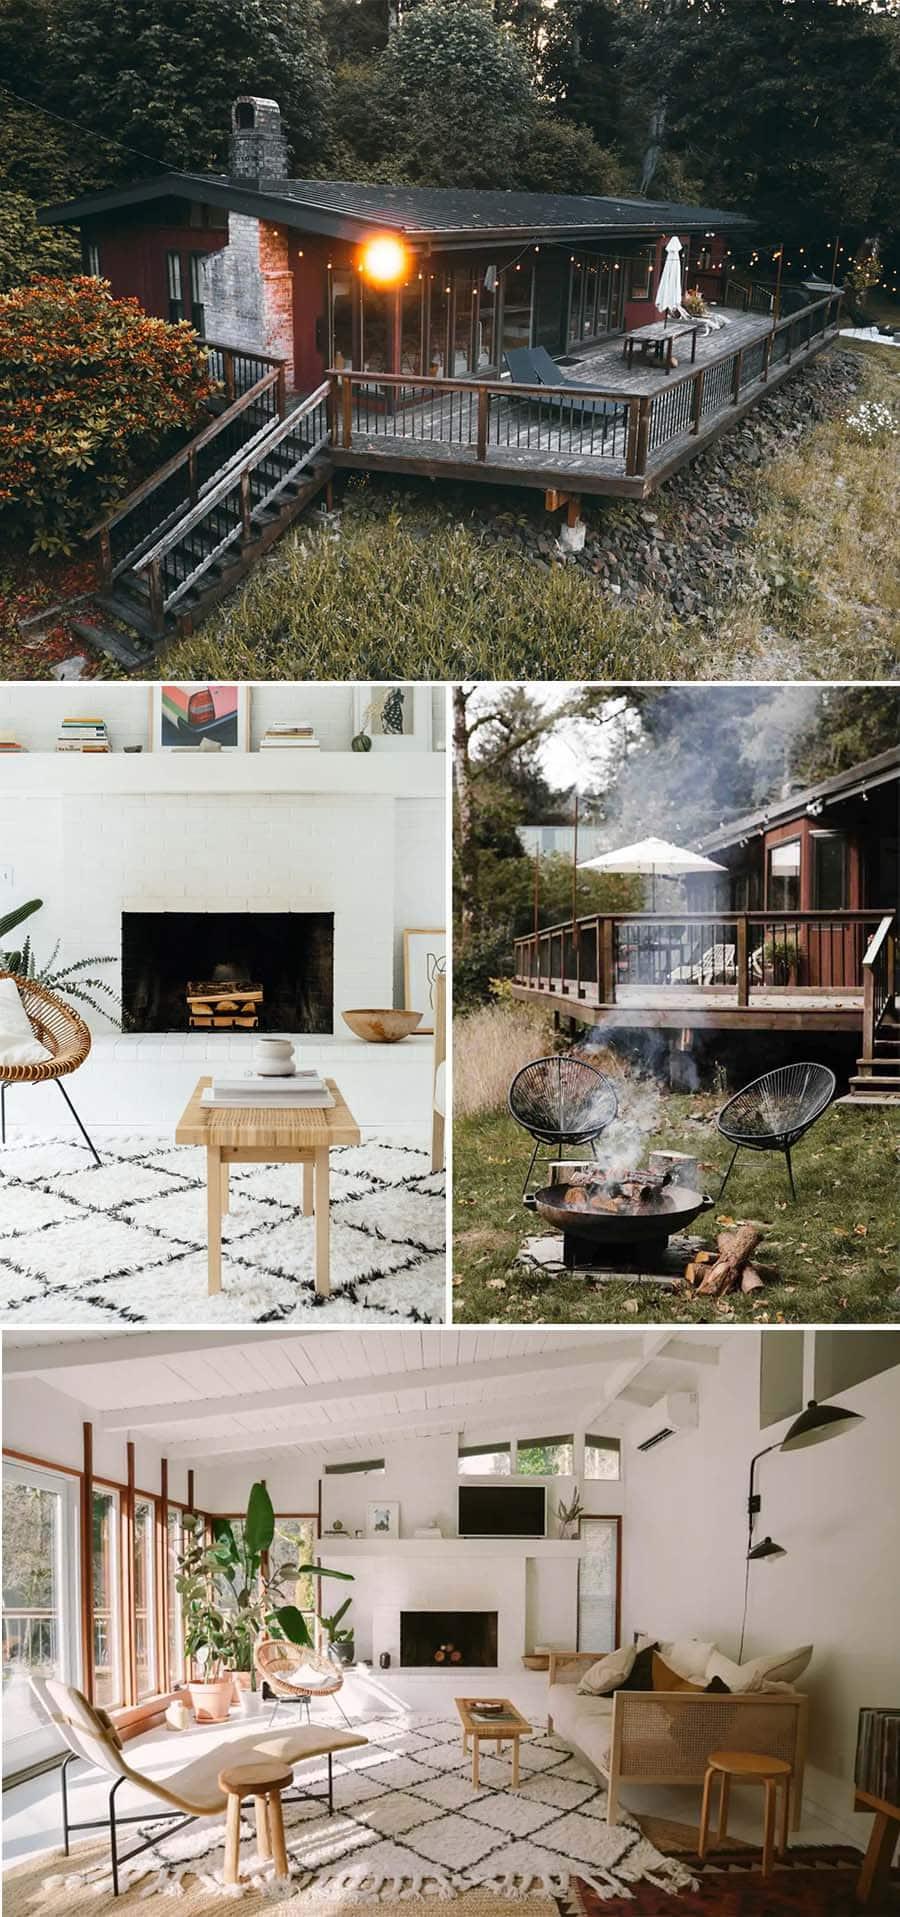 Riverfront dreamy cabin Airbnbs in Tillamook, Oregon - midcentury modren style